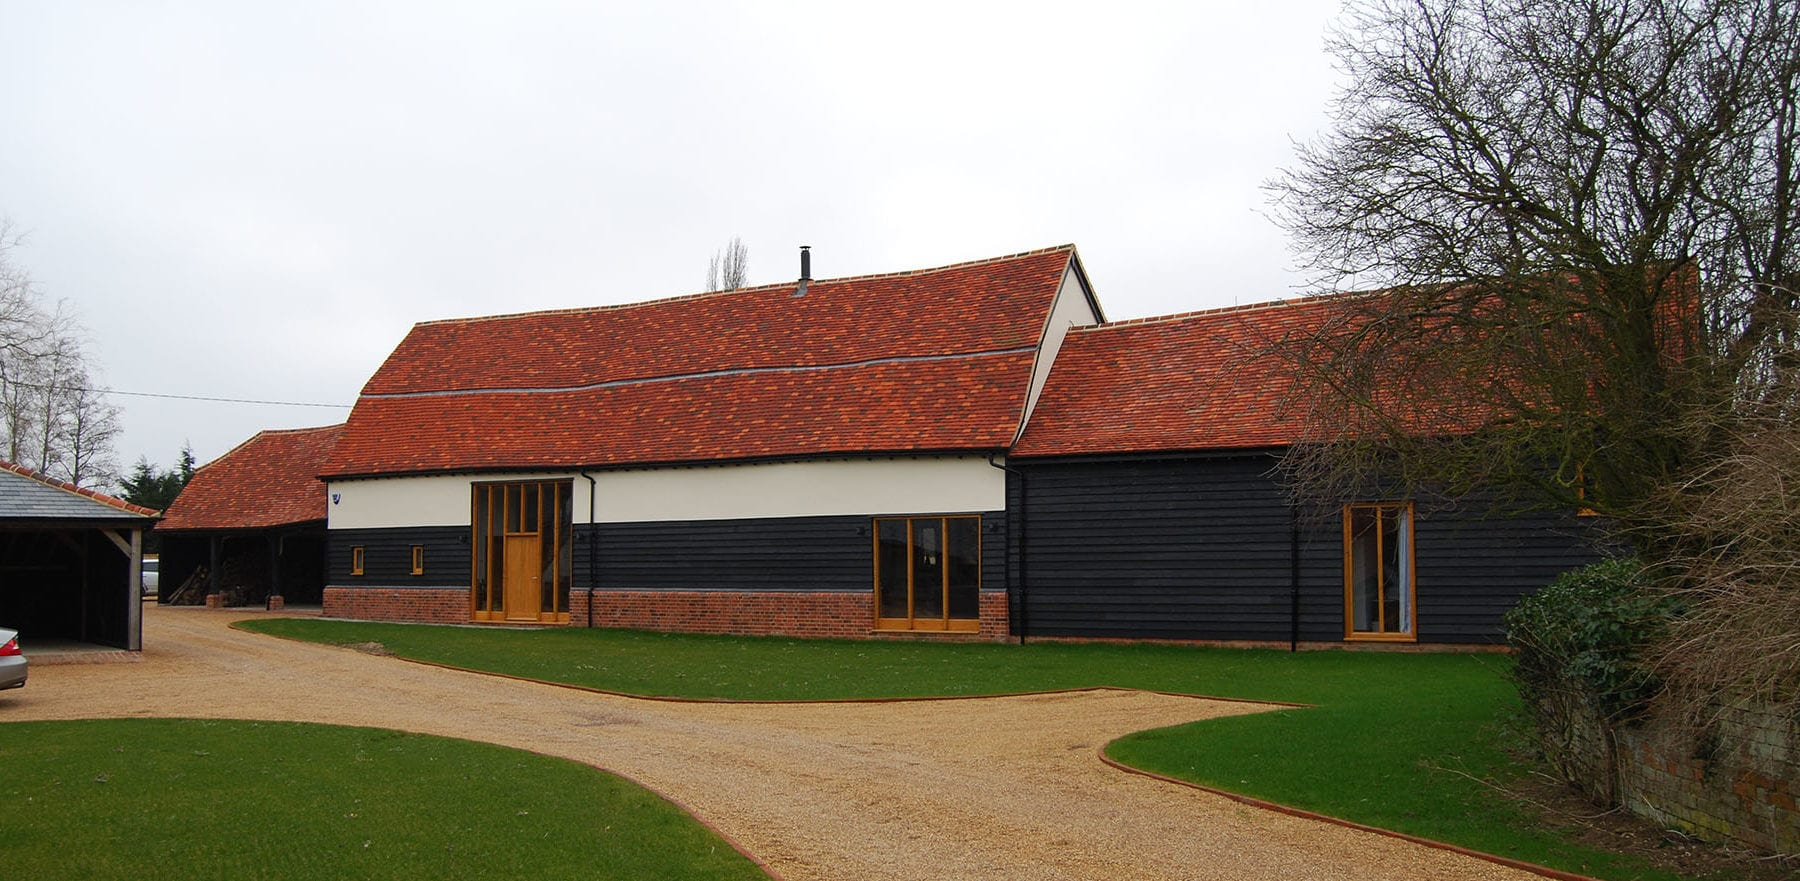 Lifestiles - Handmade Multi Clay Roof Tiles - Ford End, England 7